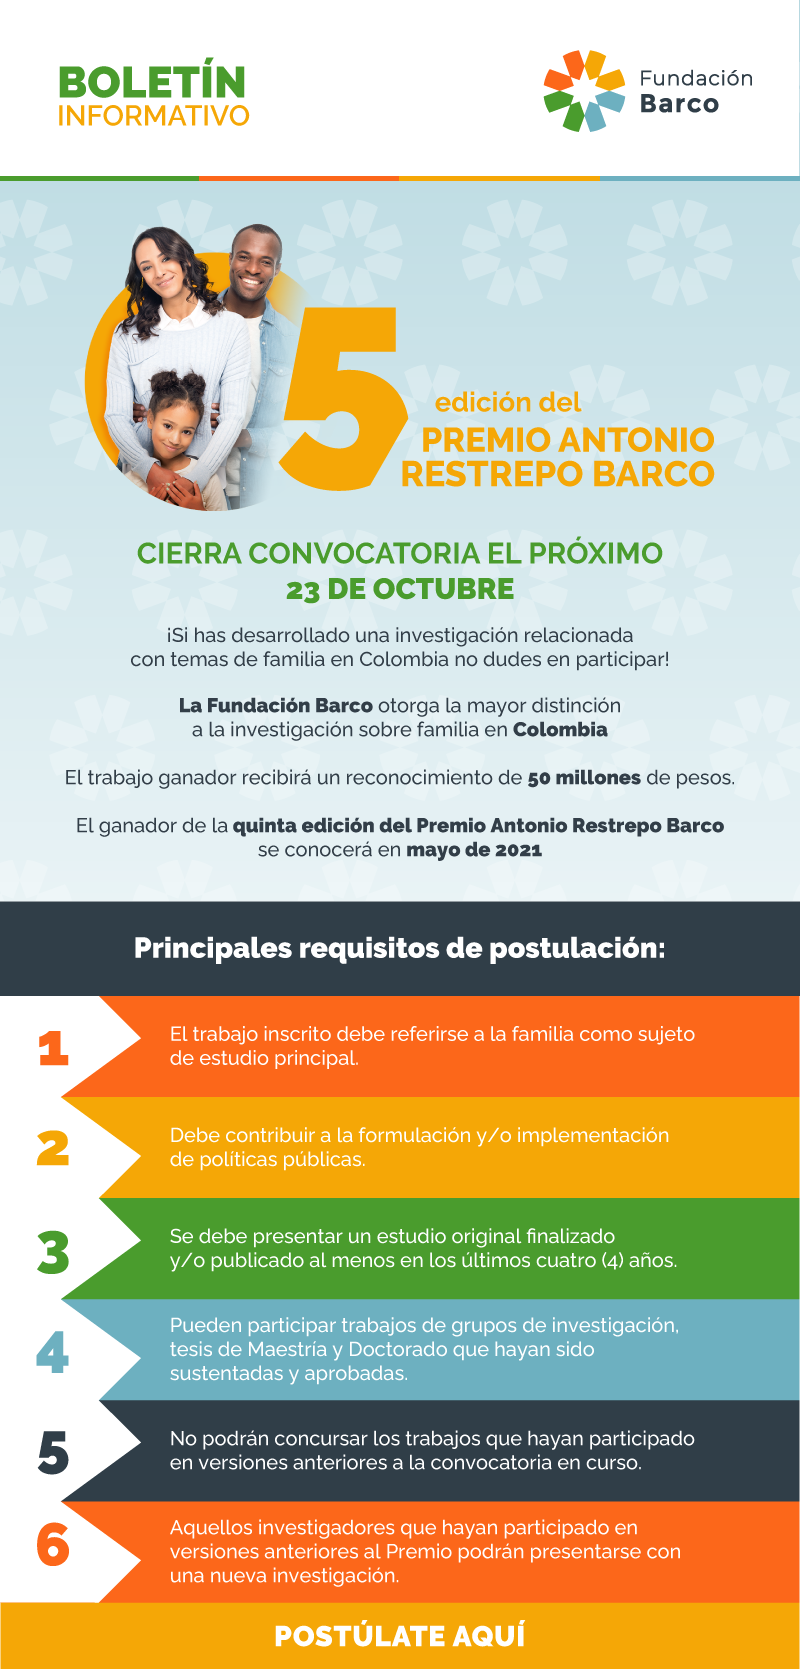 CIERRA CONVOCATORIA EL PRÓXIMO 23 DE OCTUBRE